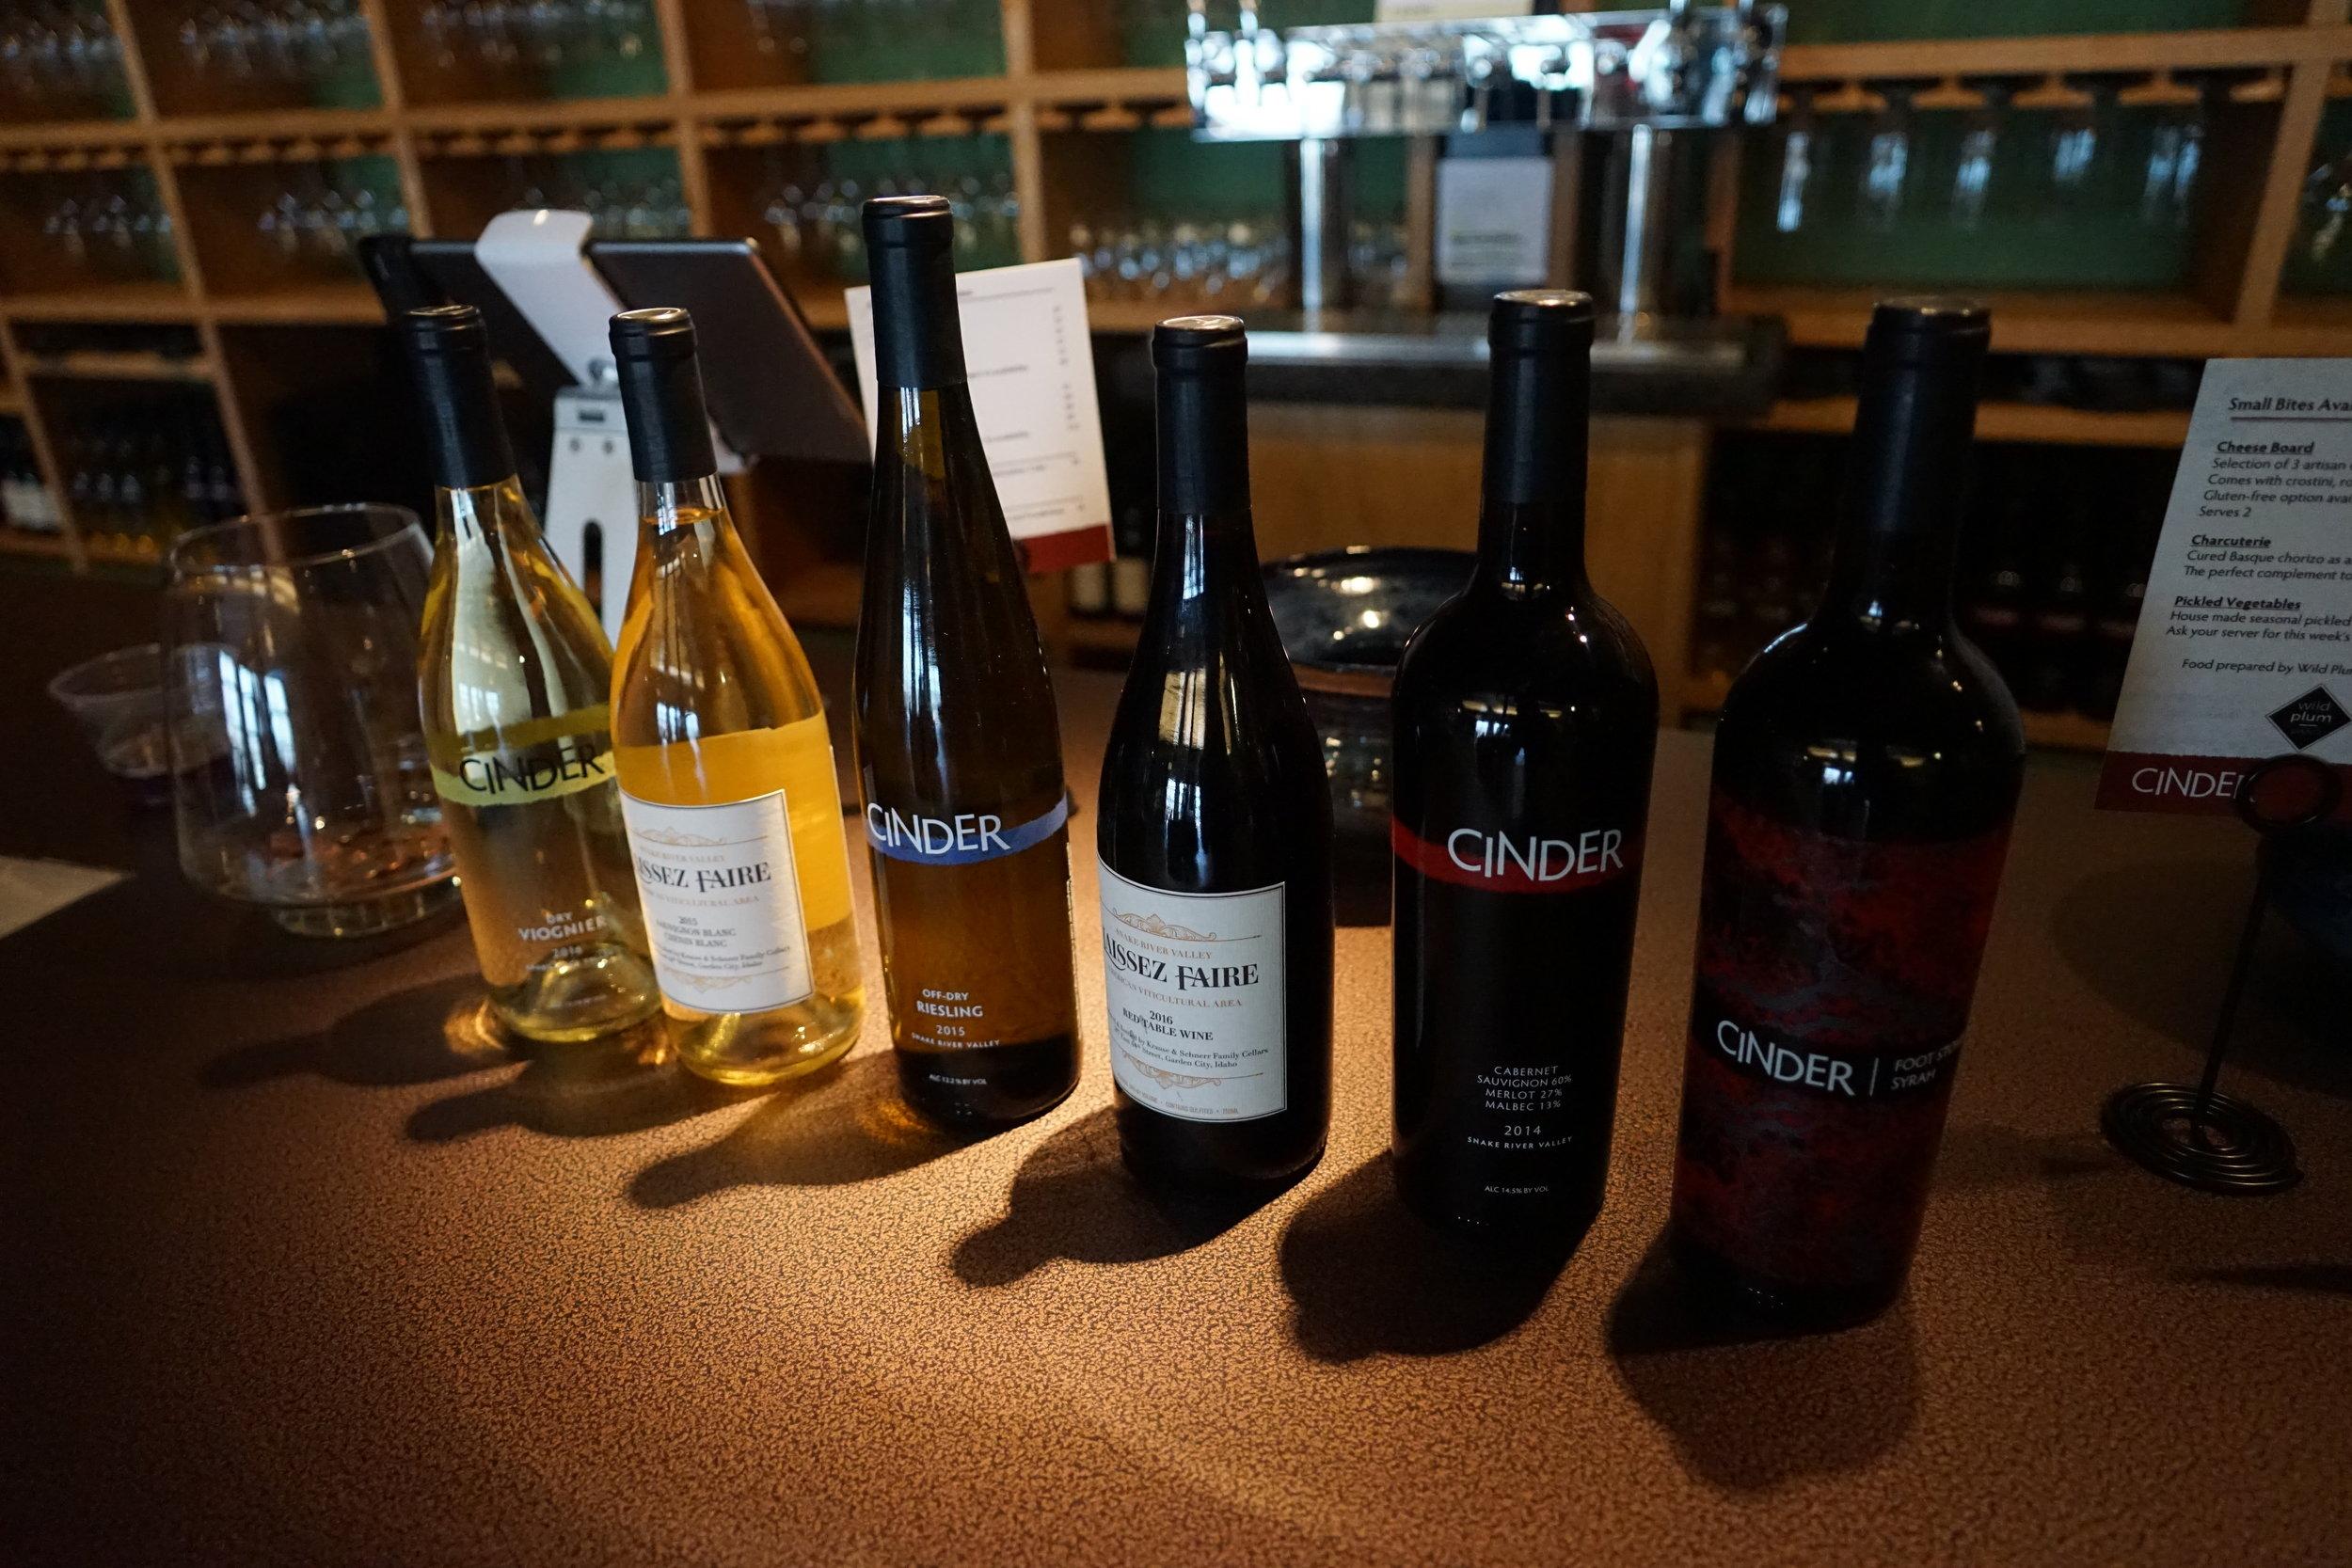 Cinder Winery